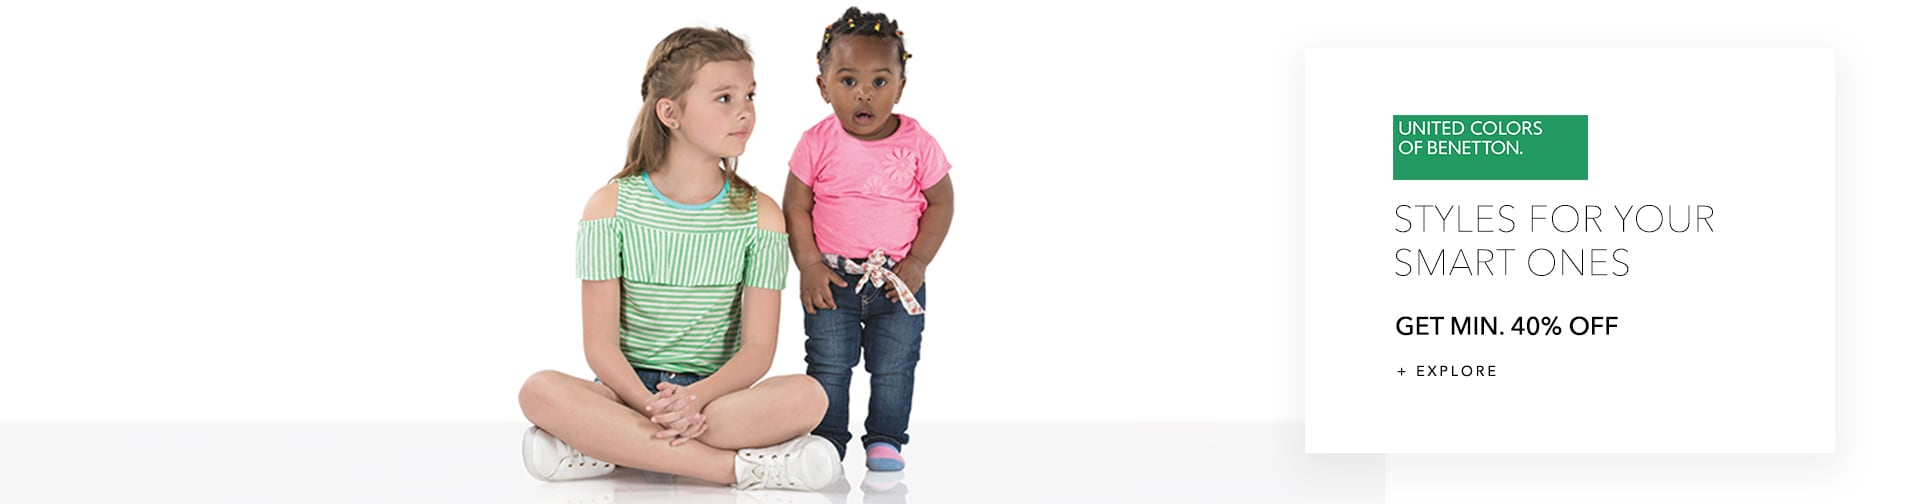 f9b0f47c47de Kids Shopping - Buy Kids Clothes, Dresses & Bottom wear Online in India